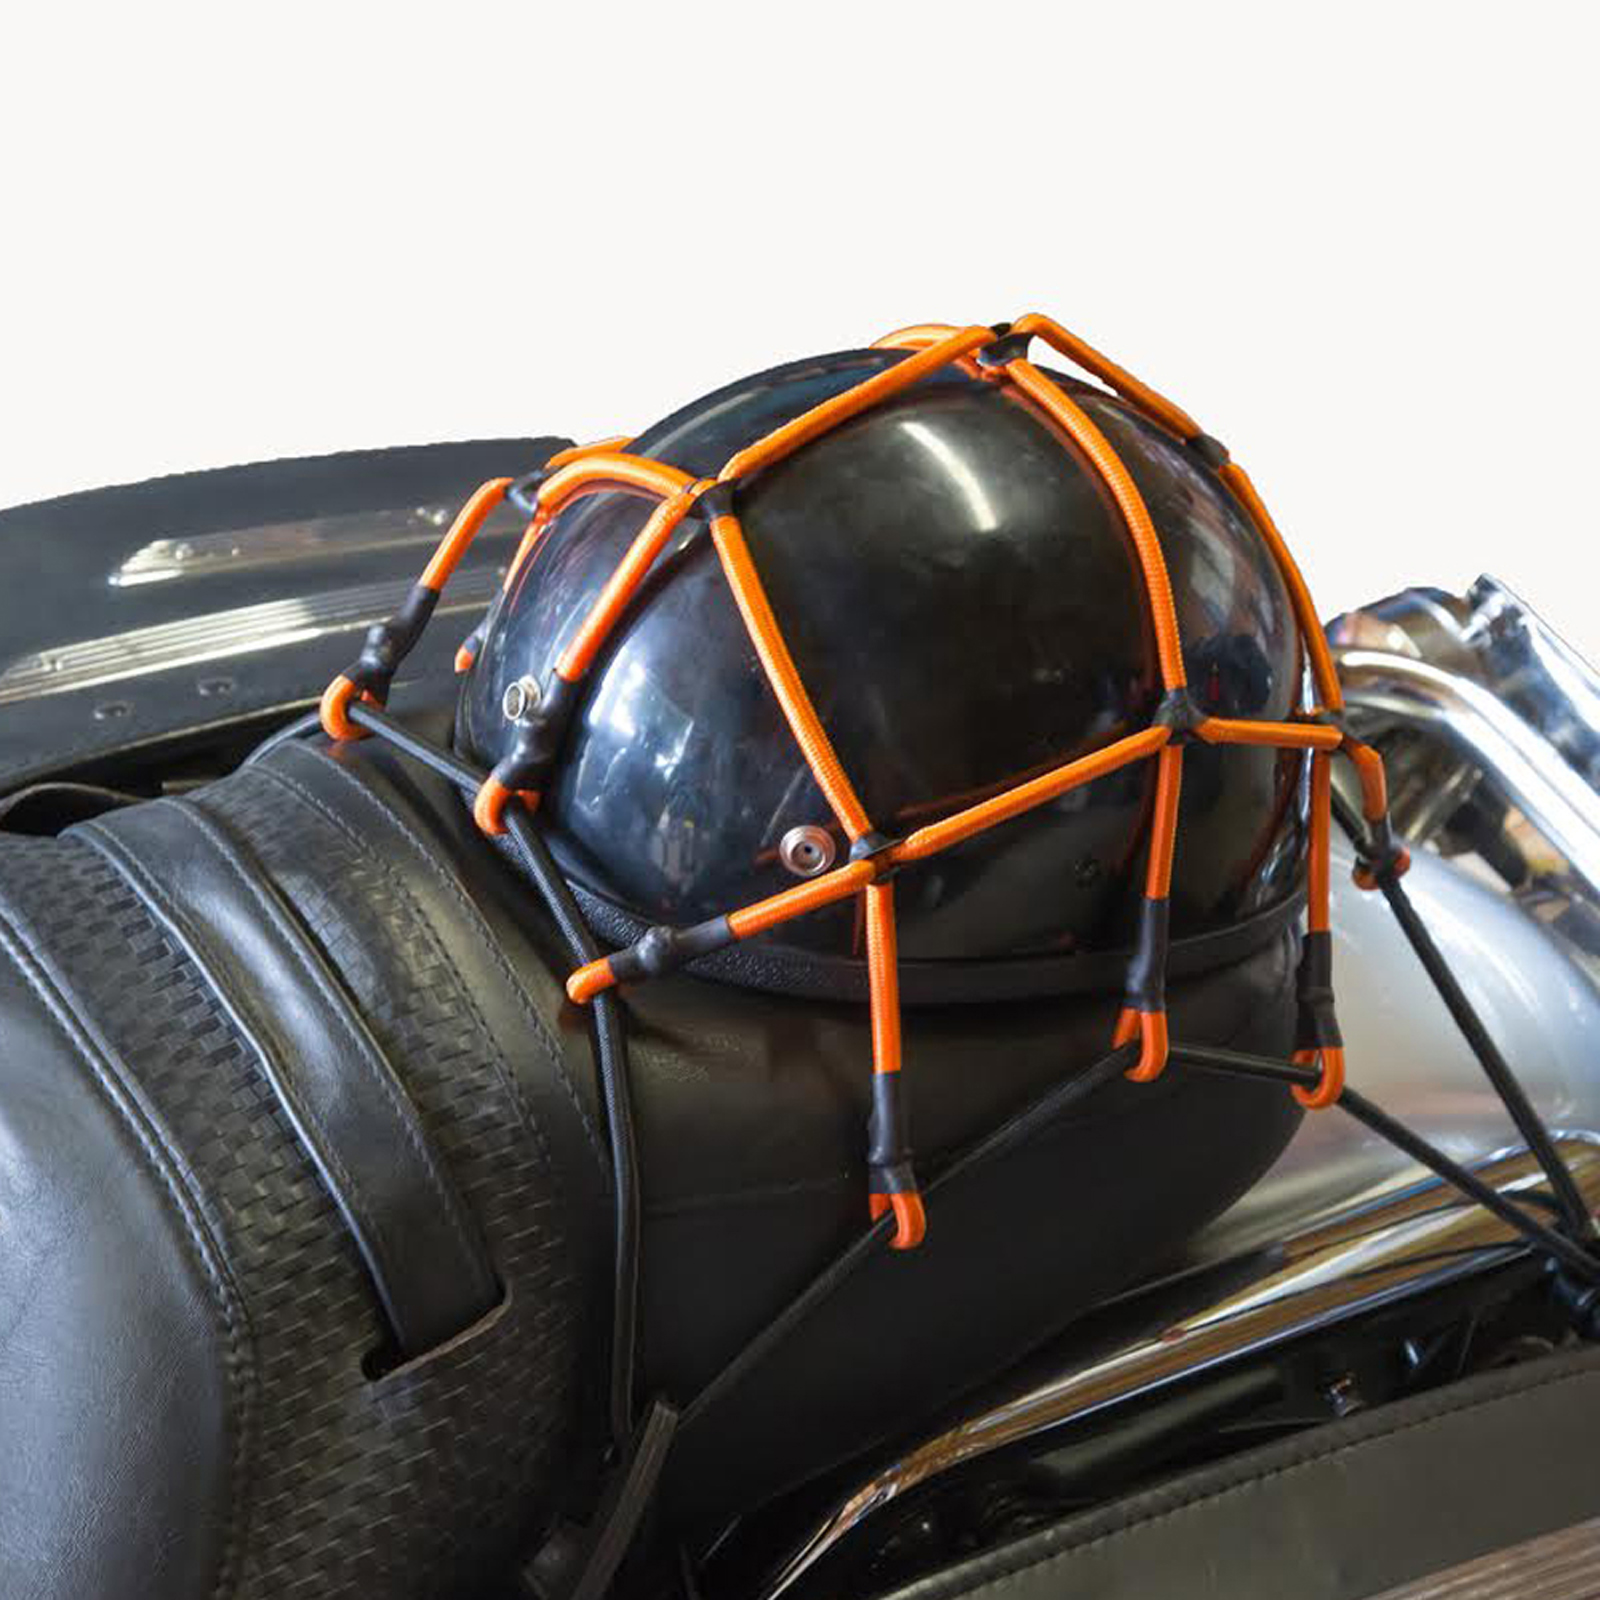 Heininger Cargo Web Net 12 x 12 Inch Durable Stretch 6 Hooks and Storage Case